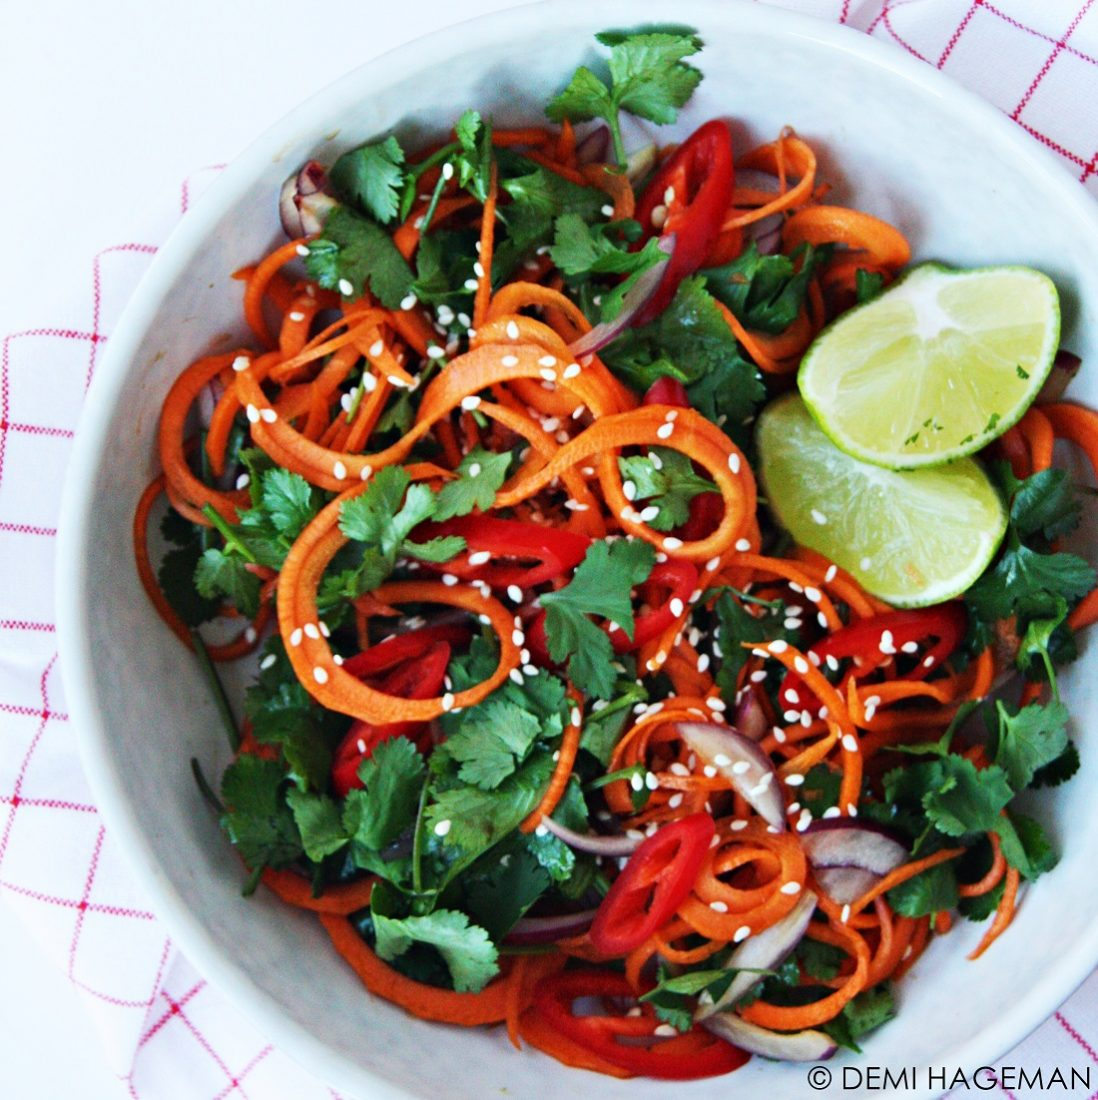 Thaise wortelsalade met gember en limoen